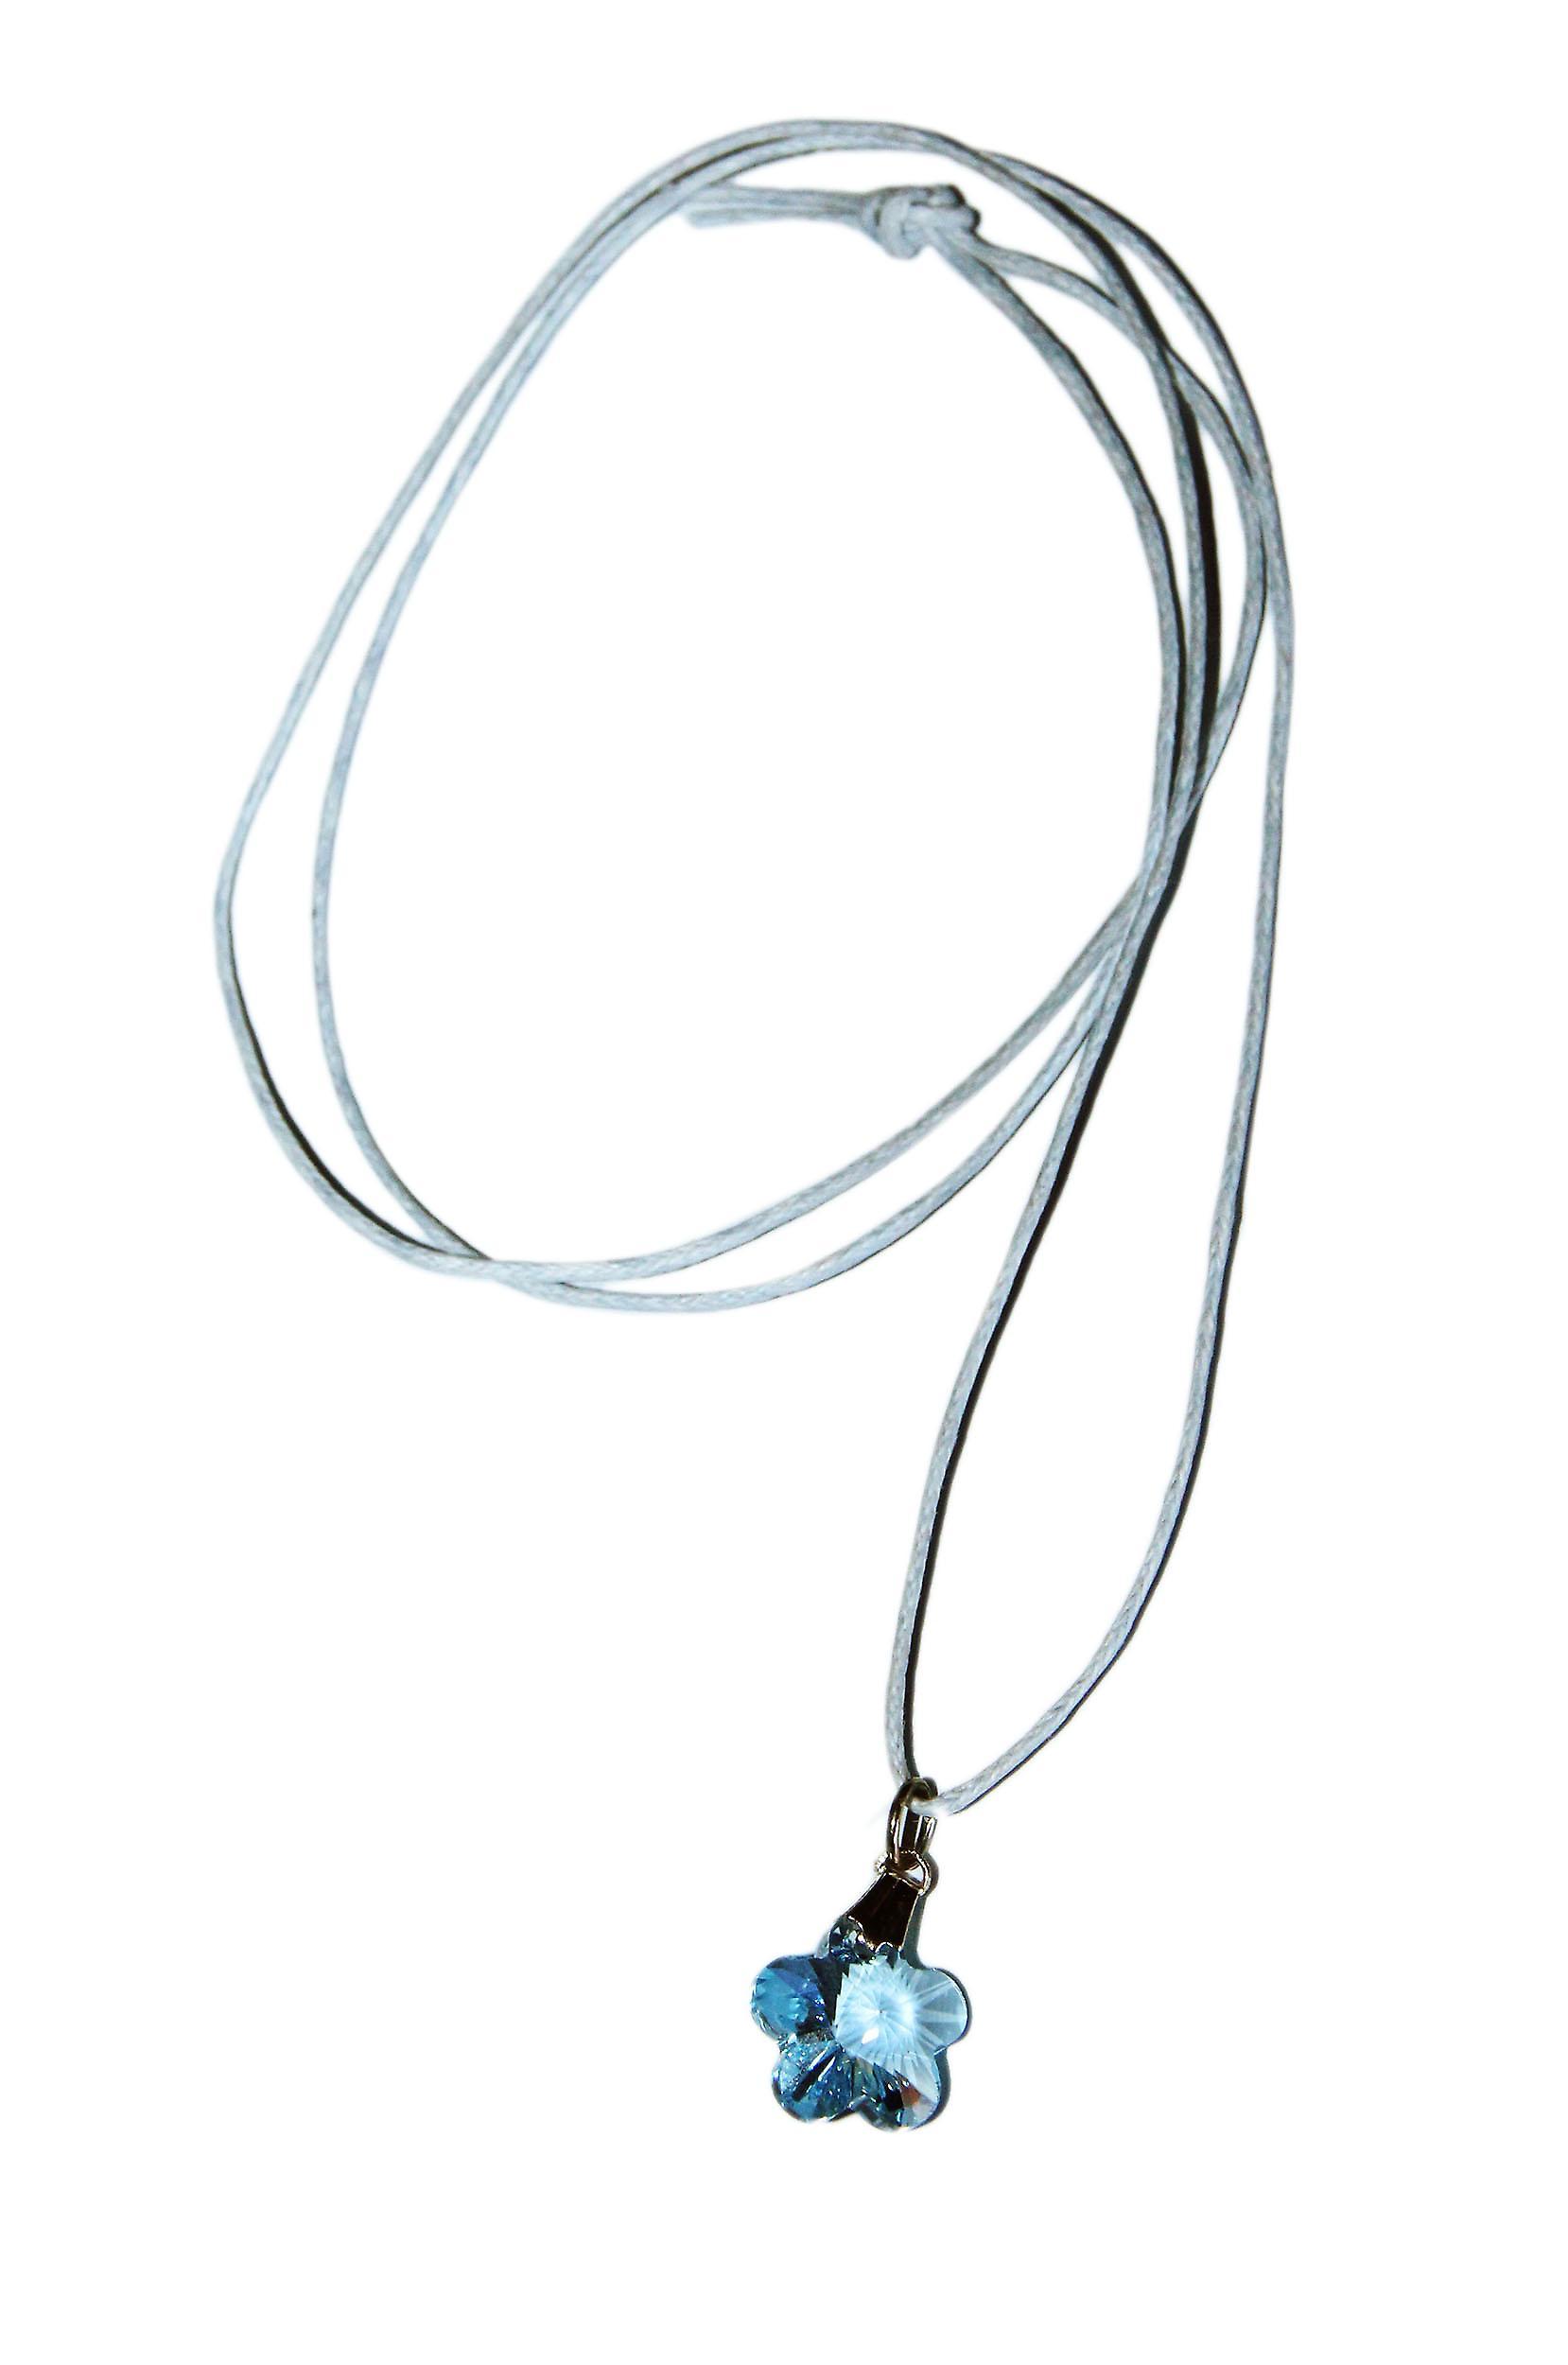 Waooh - Bijoux - Swarovski / Pendentif fleur bleu et cordon ciré